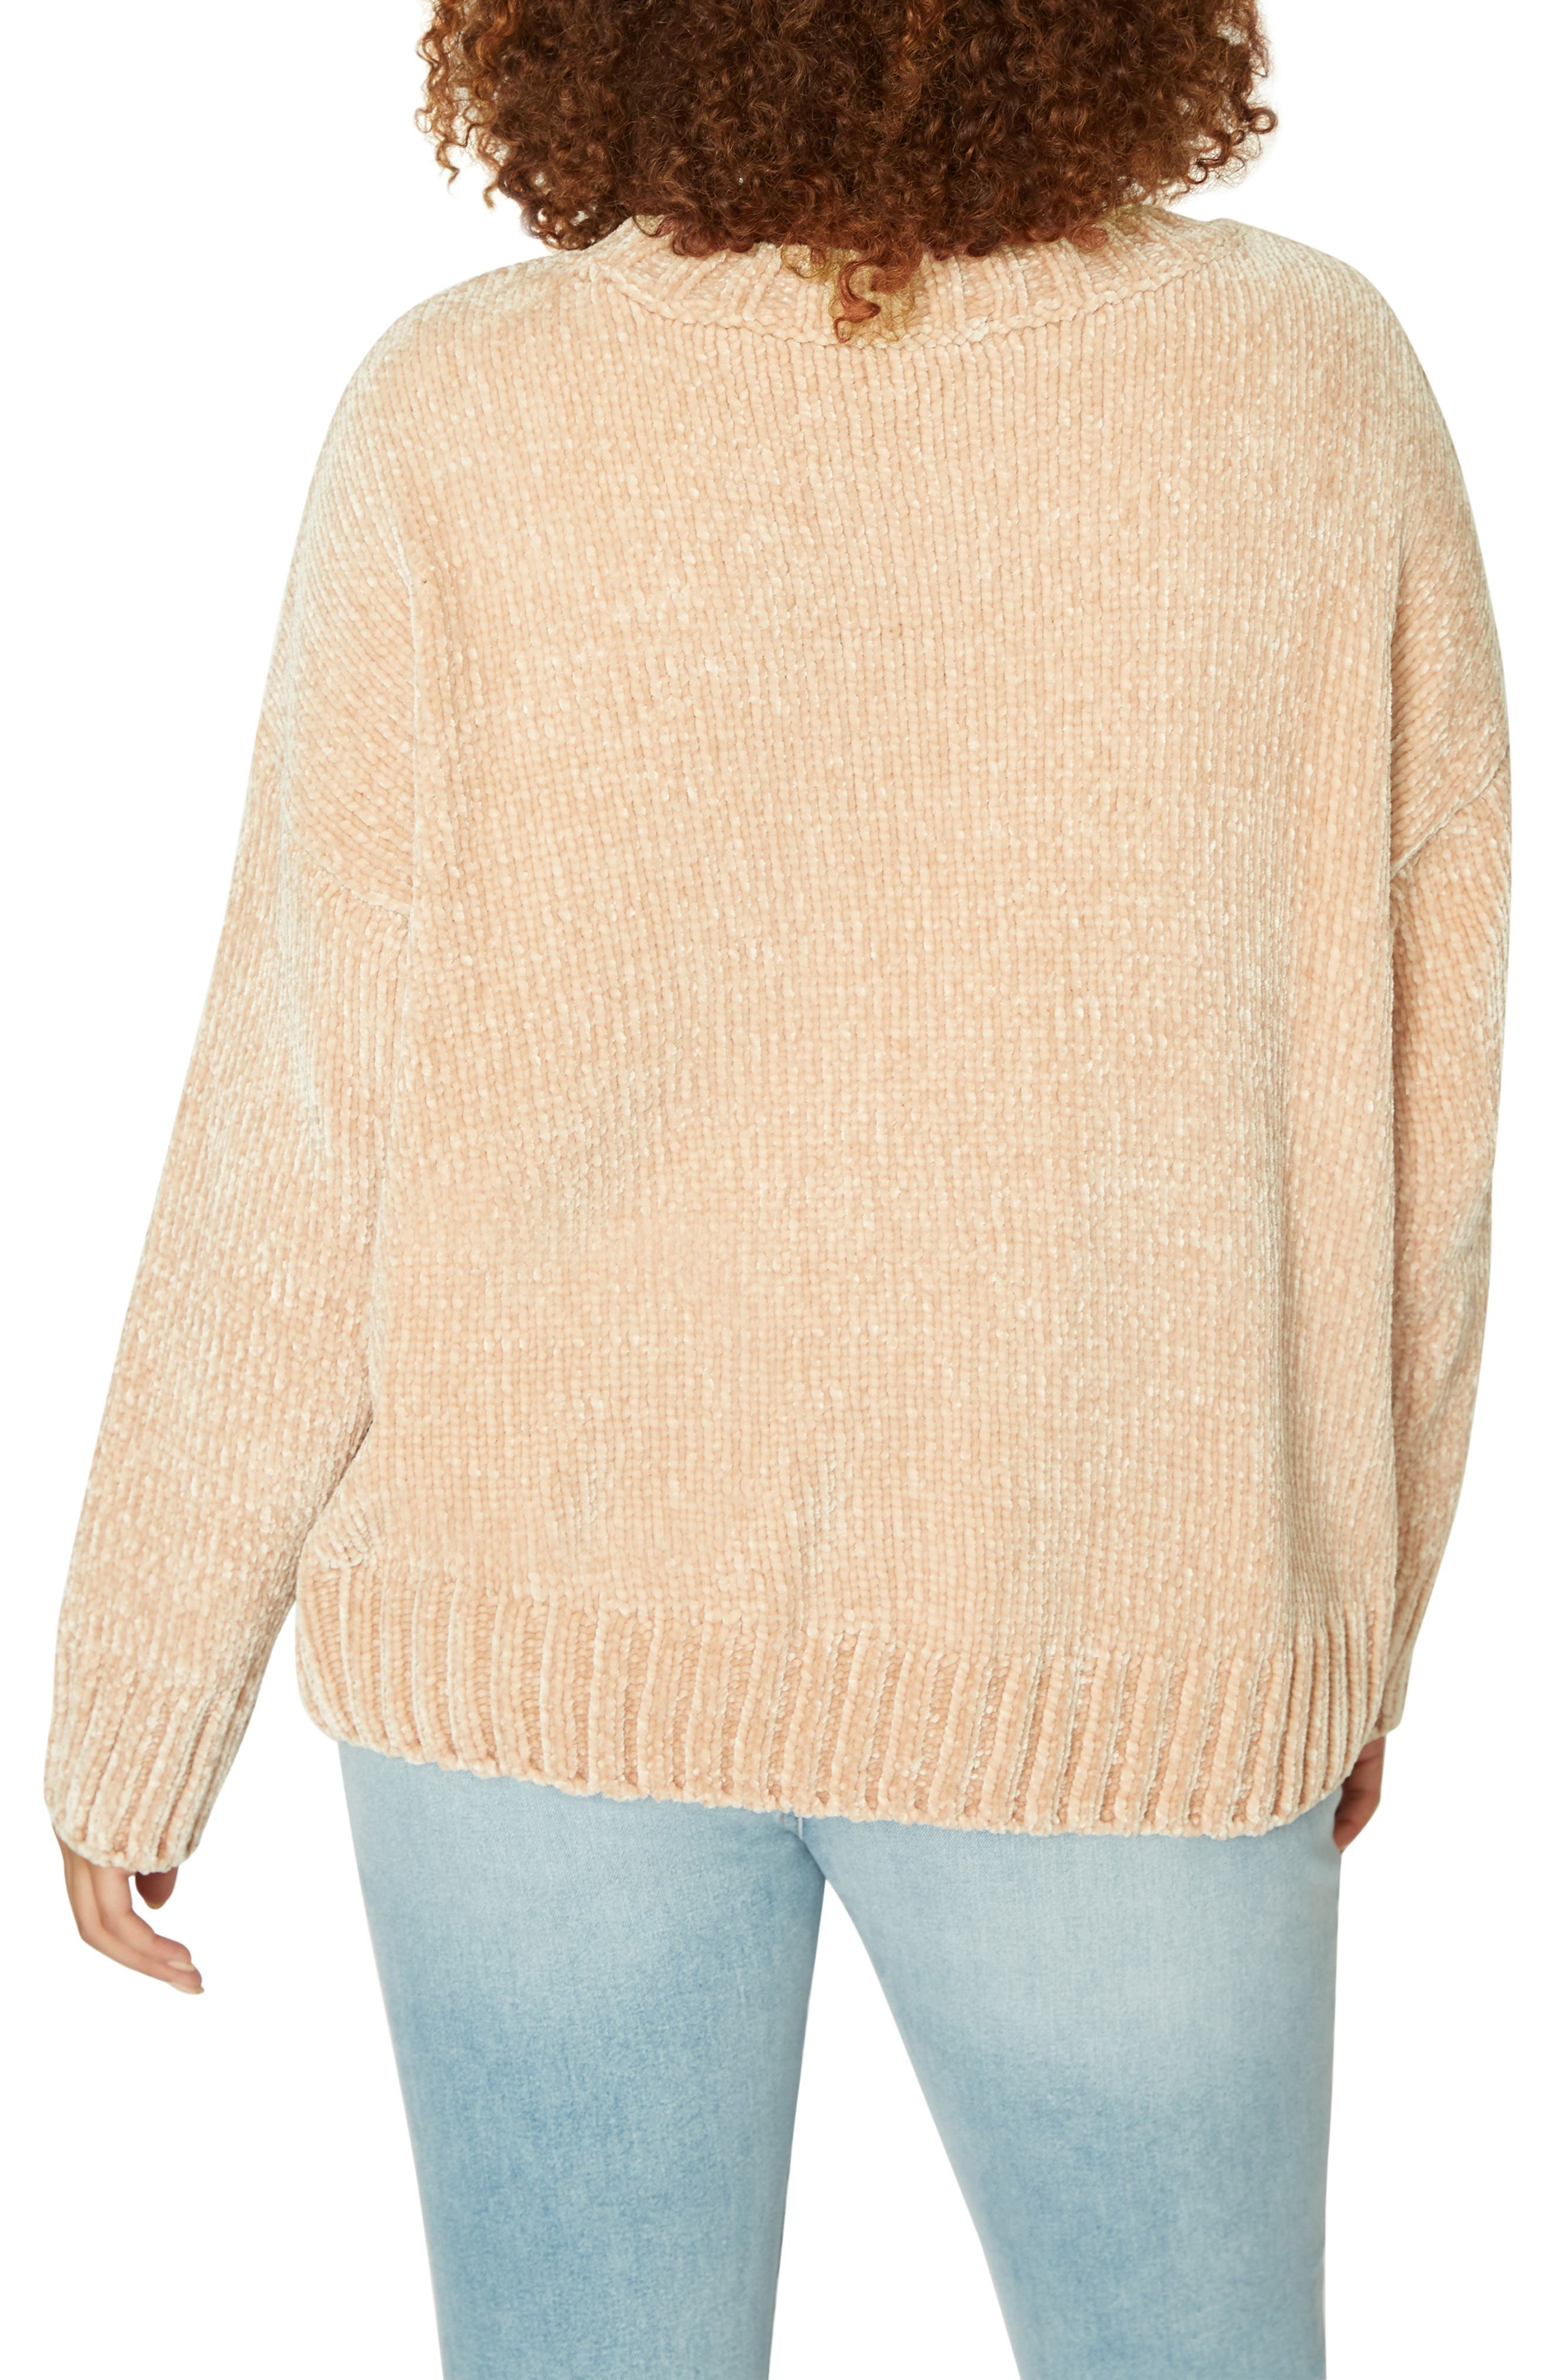 Chenille Crewneck Sweater,                             Alternate thumbnail 2, color,                             CHAMPAGNE